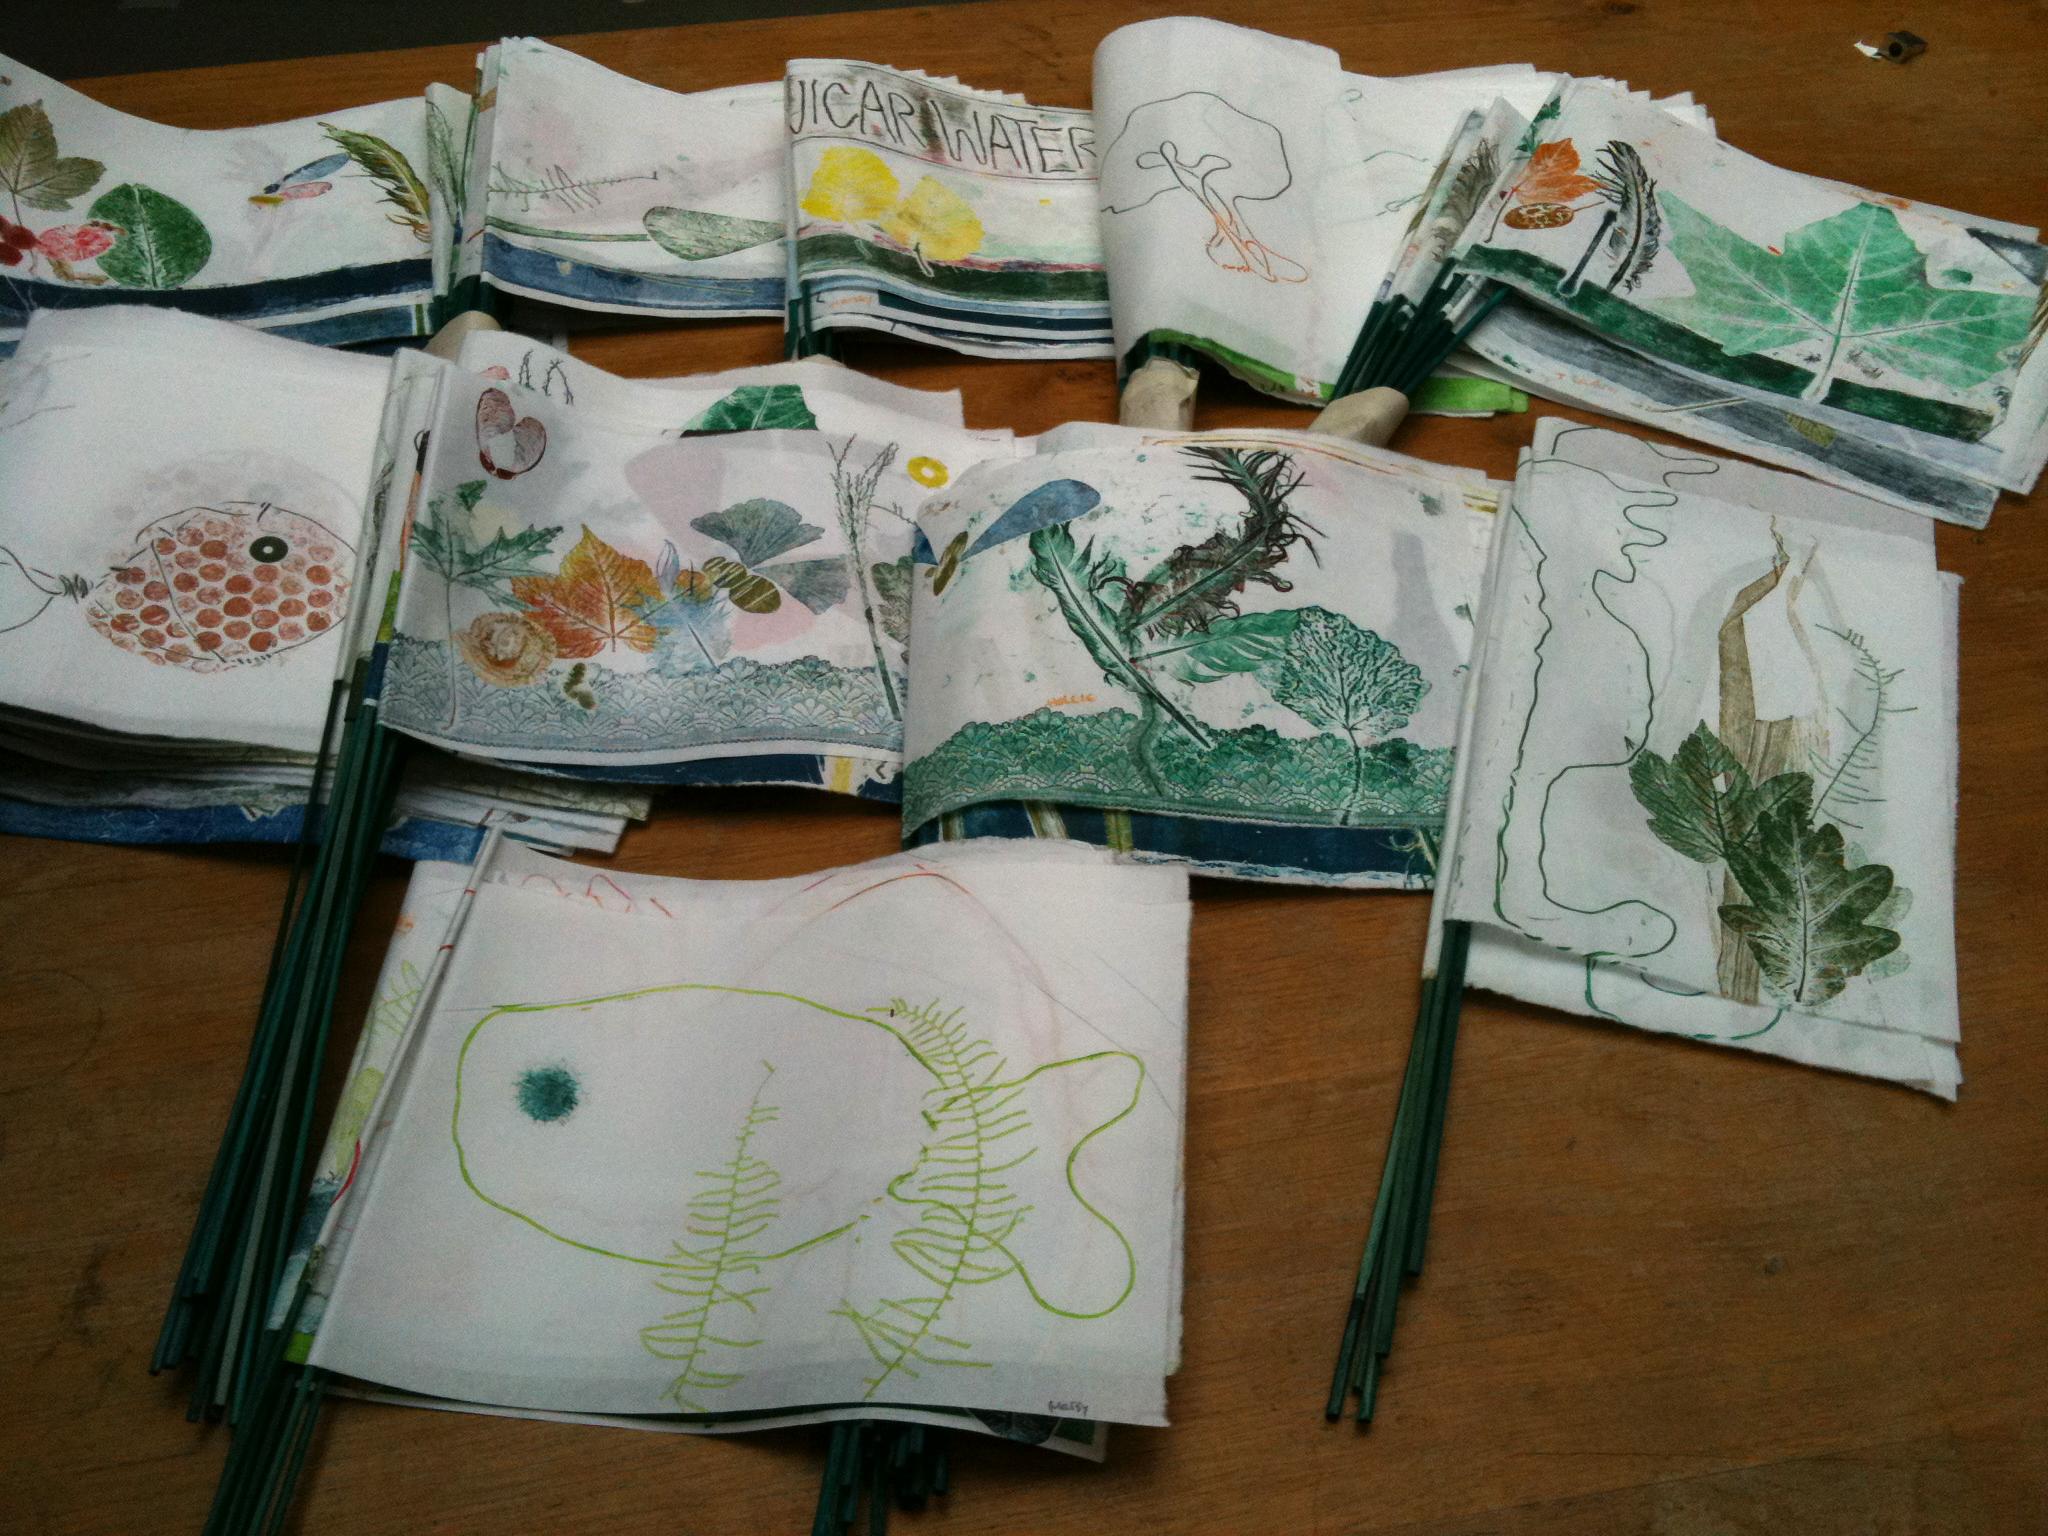 Breath of Fresh Air, Vicar Water, Prints by primary schools